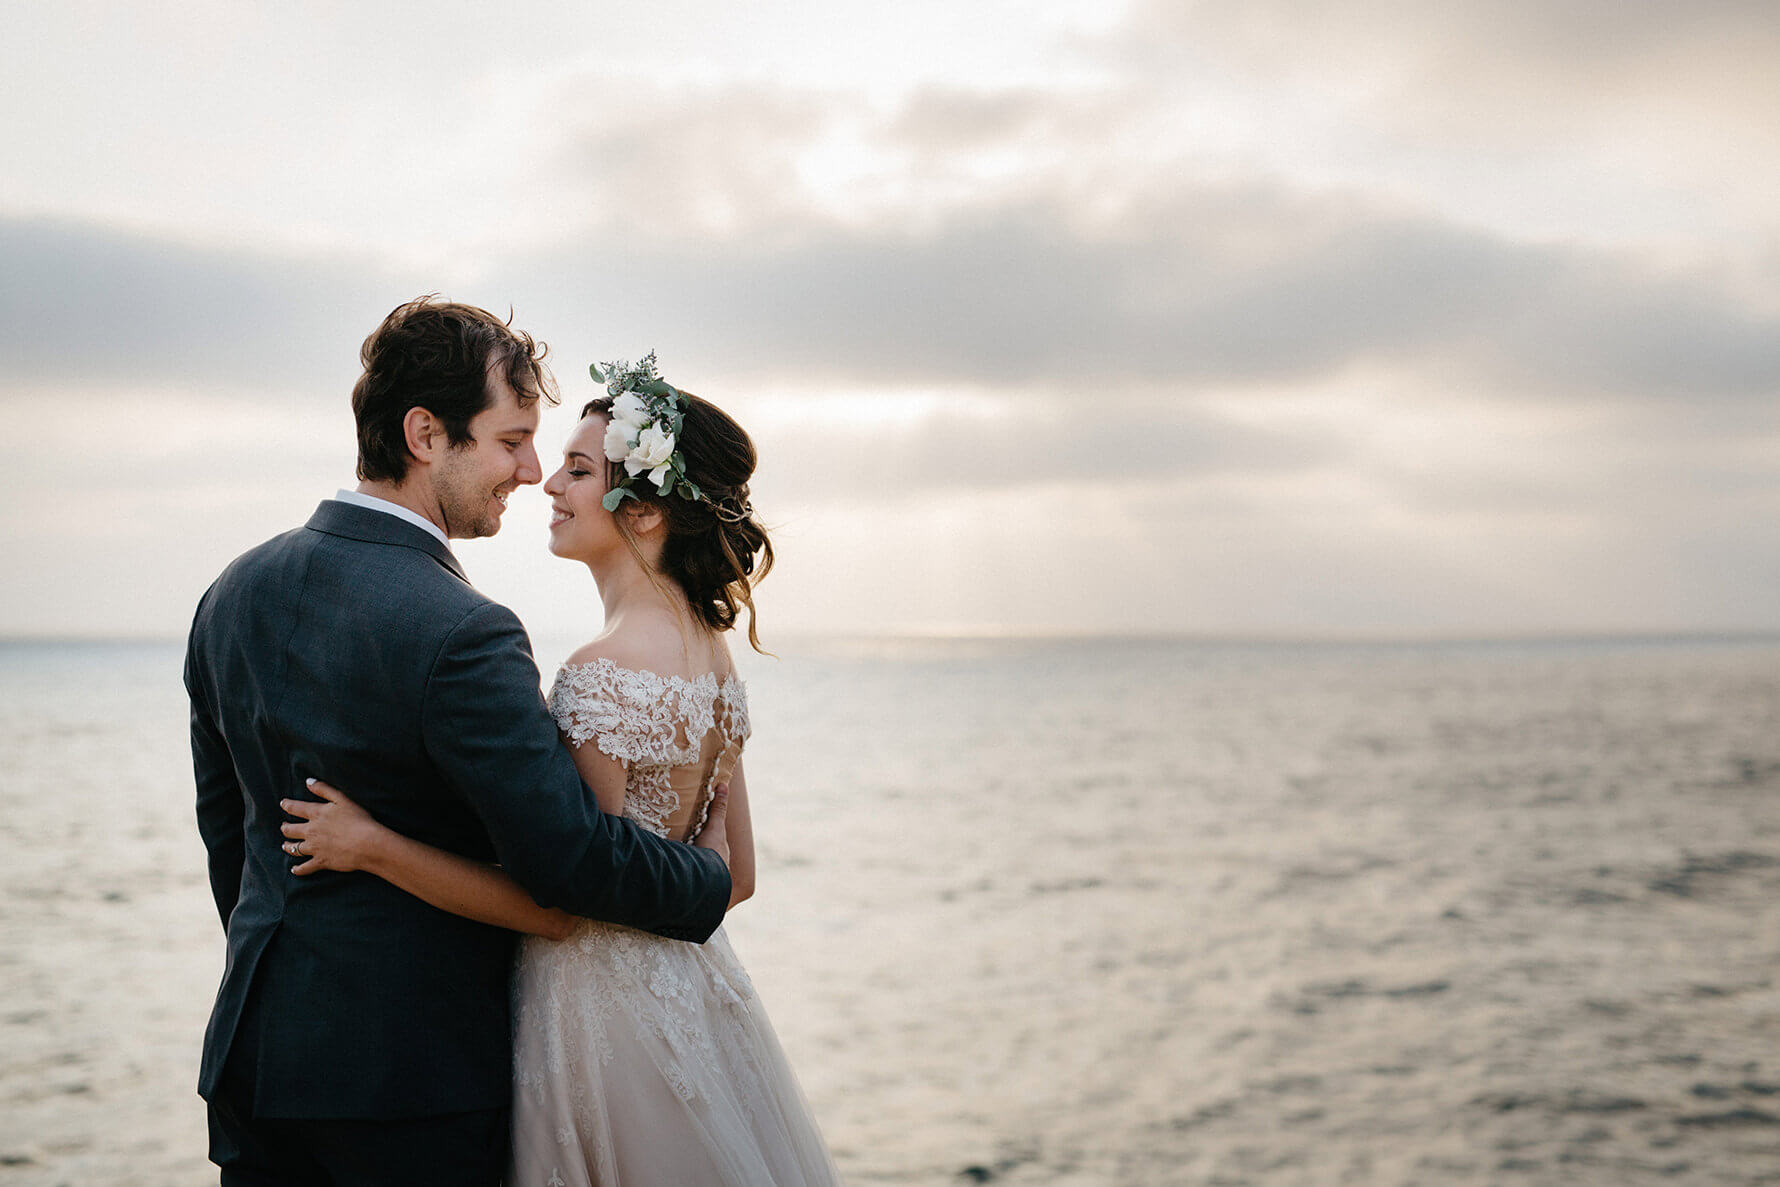 Timeless Romance San Diego Bride & Groom Portraits   Lauren DeGracia